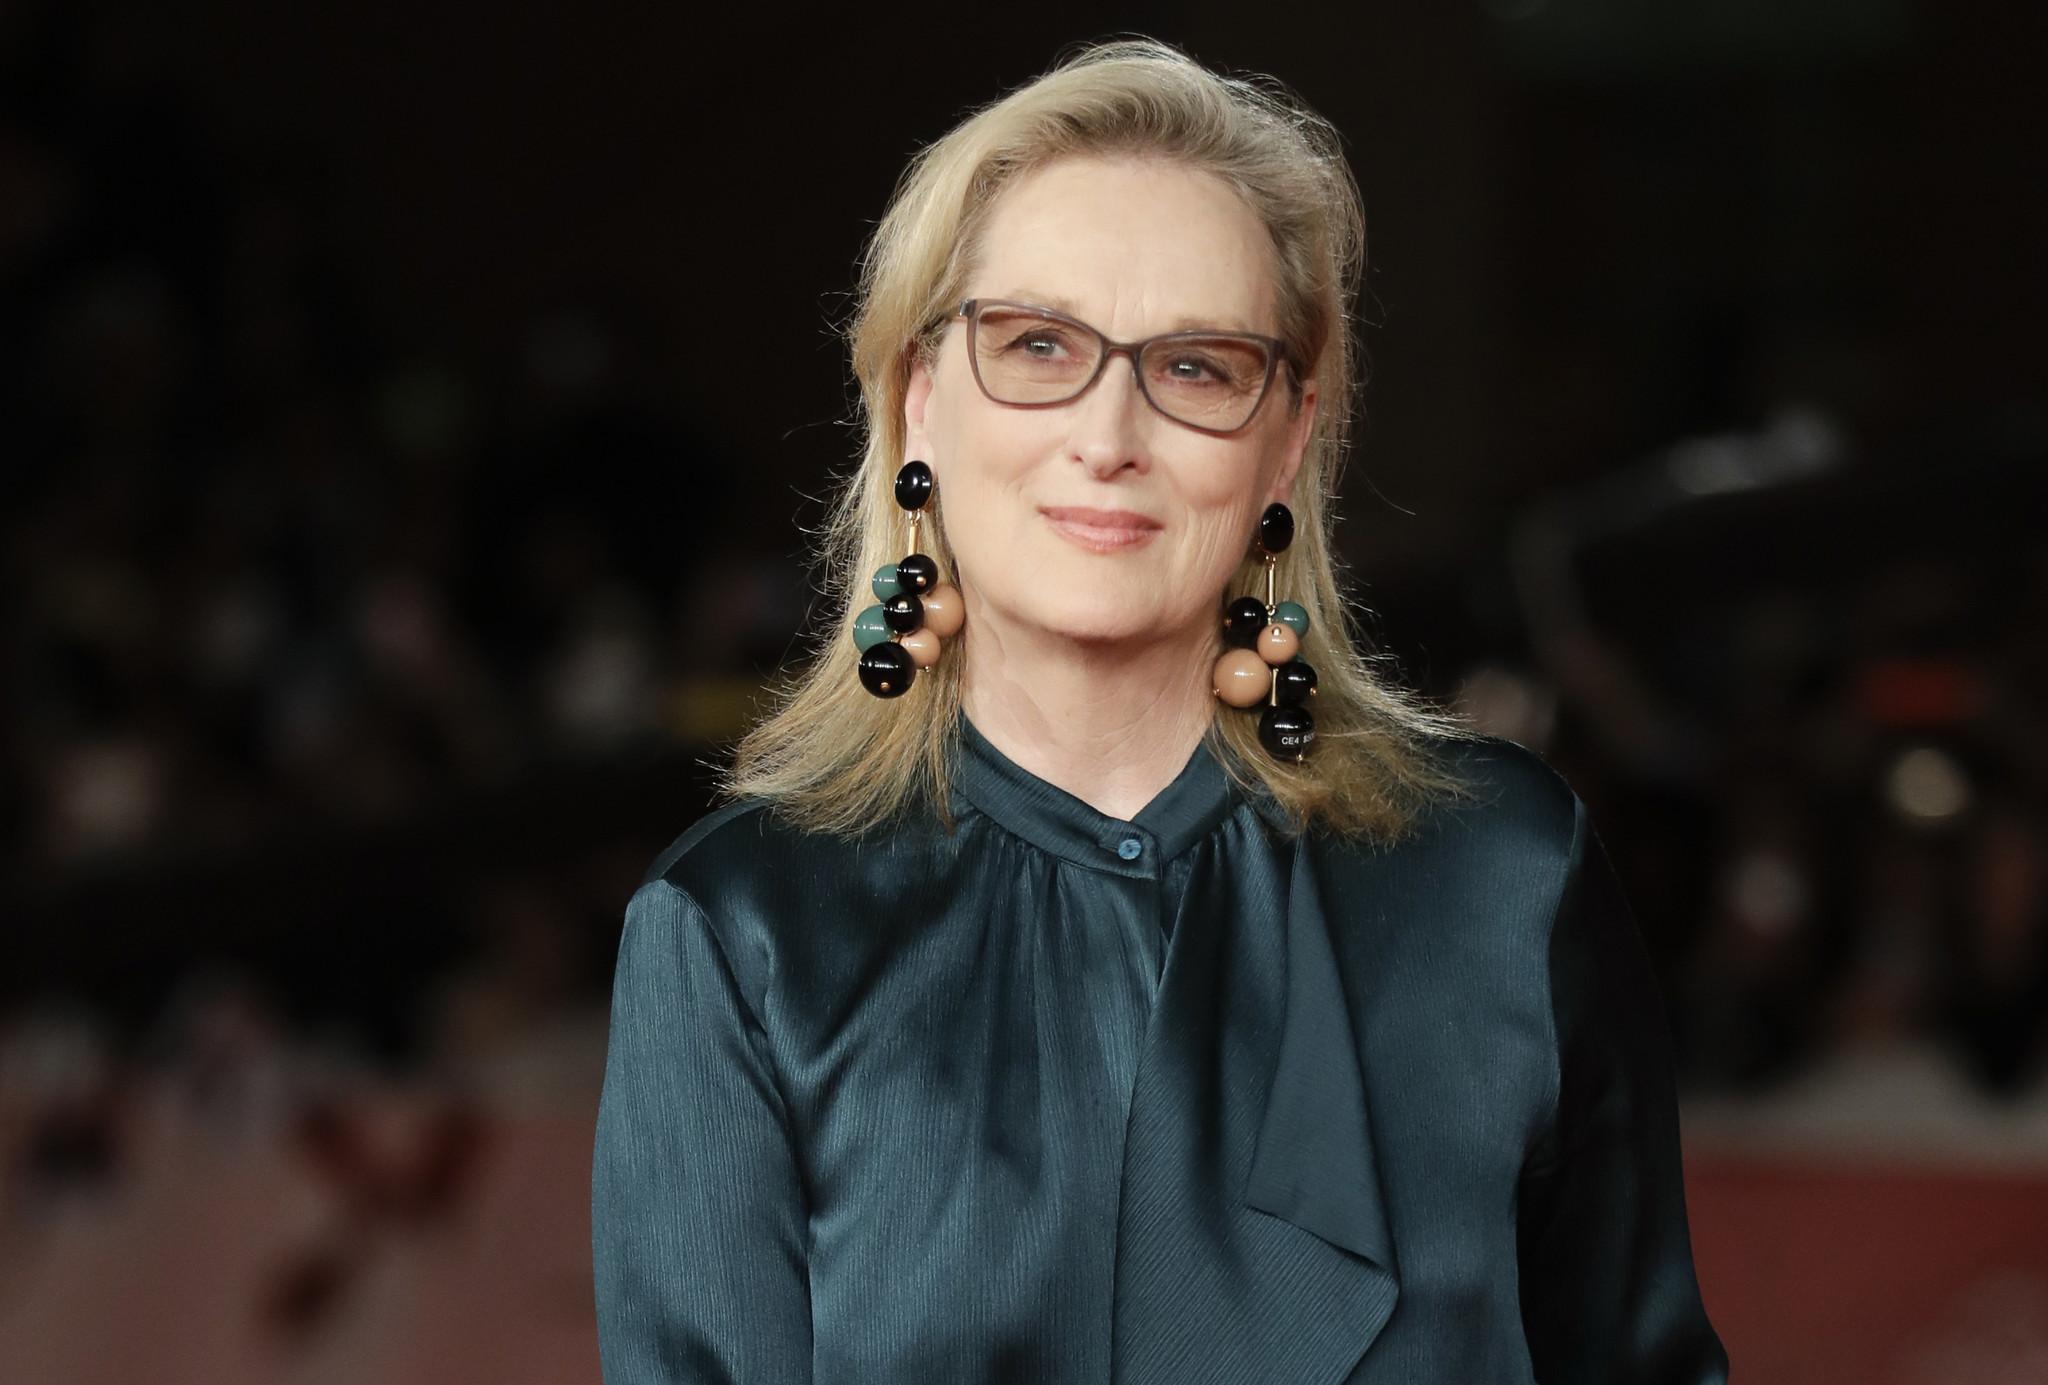 Meryl Streep glass